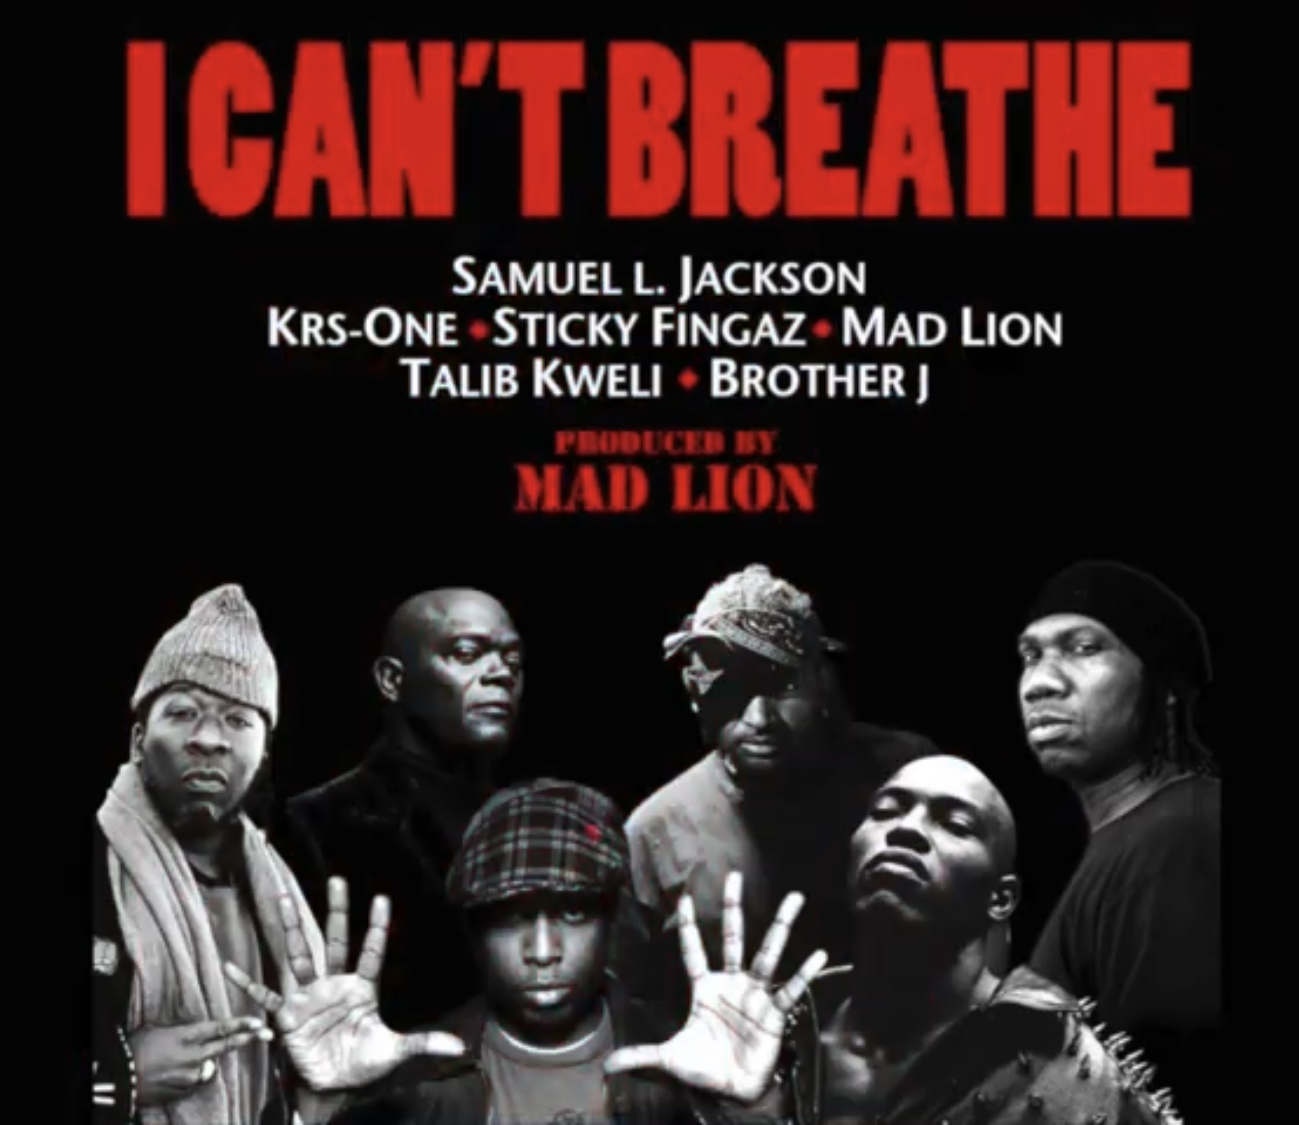 Sticky Fingaz - I Can't Breathe feat. Sam Jackson, Talib Kweli, KRS One, Brother J & Mad Lion [Video]